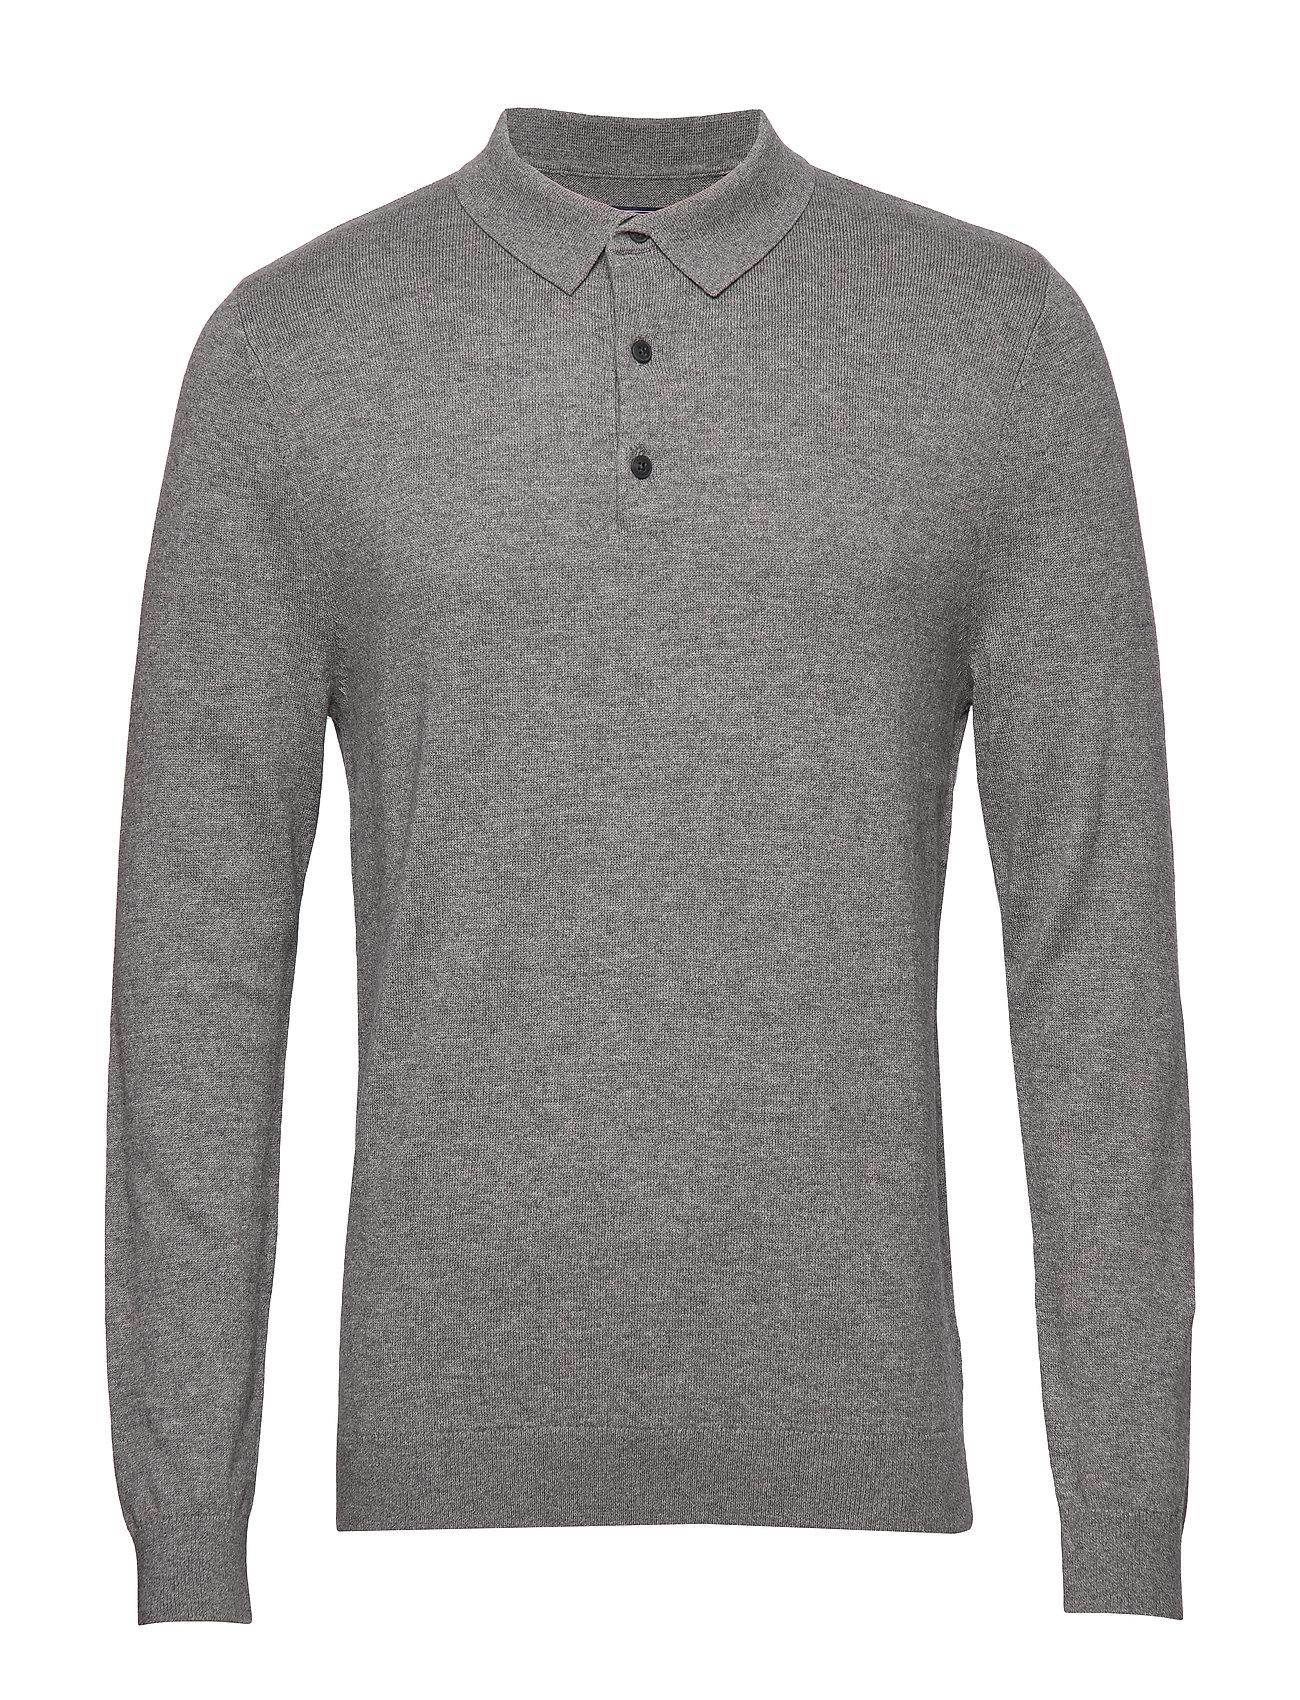 Lexington Clothing Riley Knitted Long Sleeve Polo - GRAY MELANGE